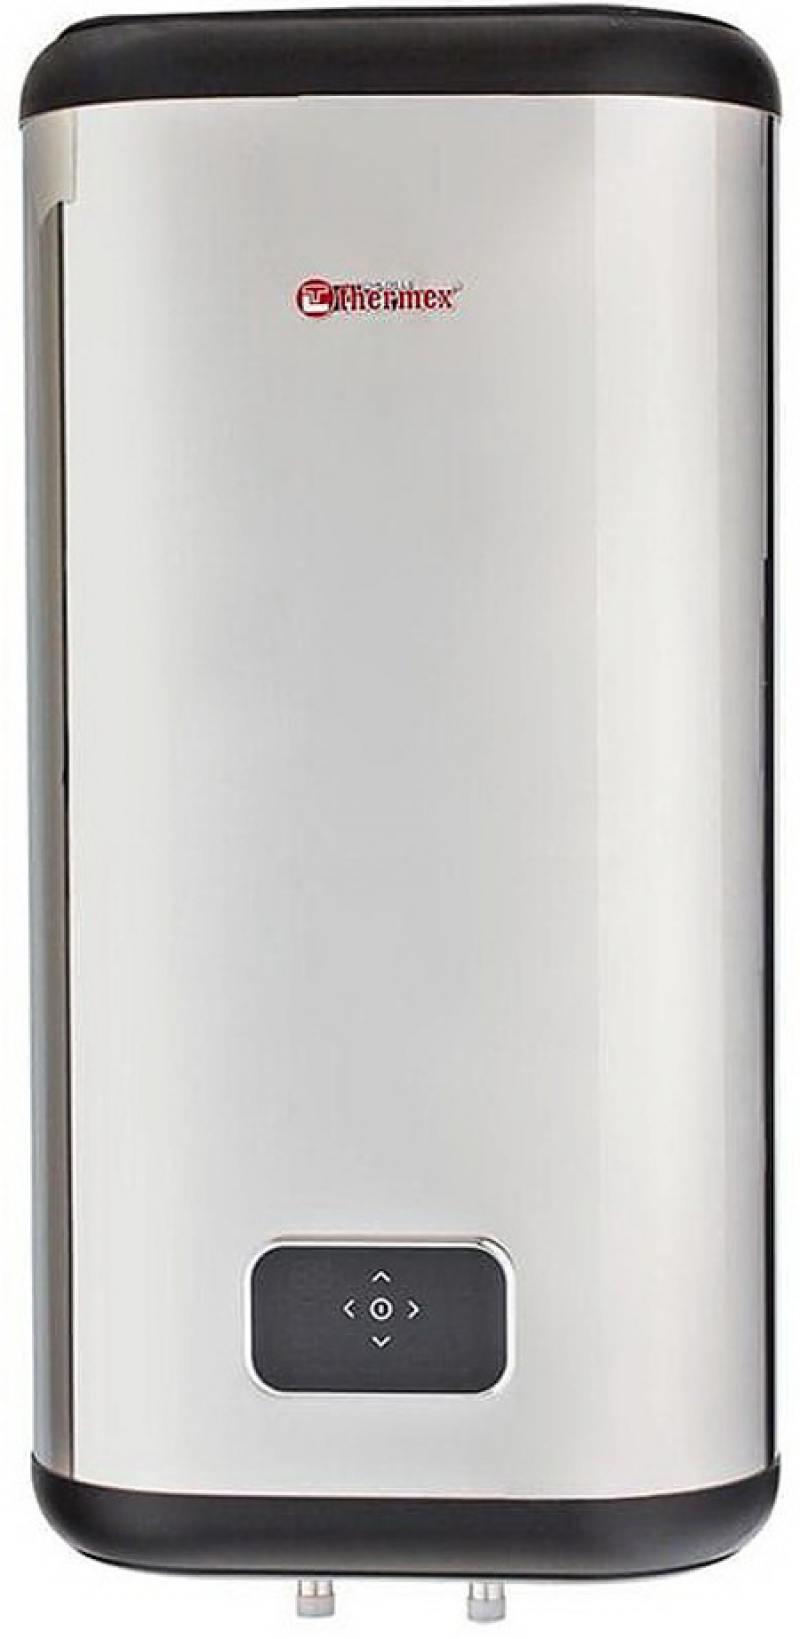 Водонагреватель накопительный Thermex Flat Diamond Touch ID 100 V 100л 2кВт серебристый накопительный водонагреватель thermex flat smart energy fss 100 v